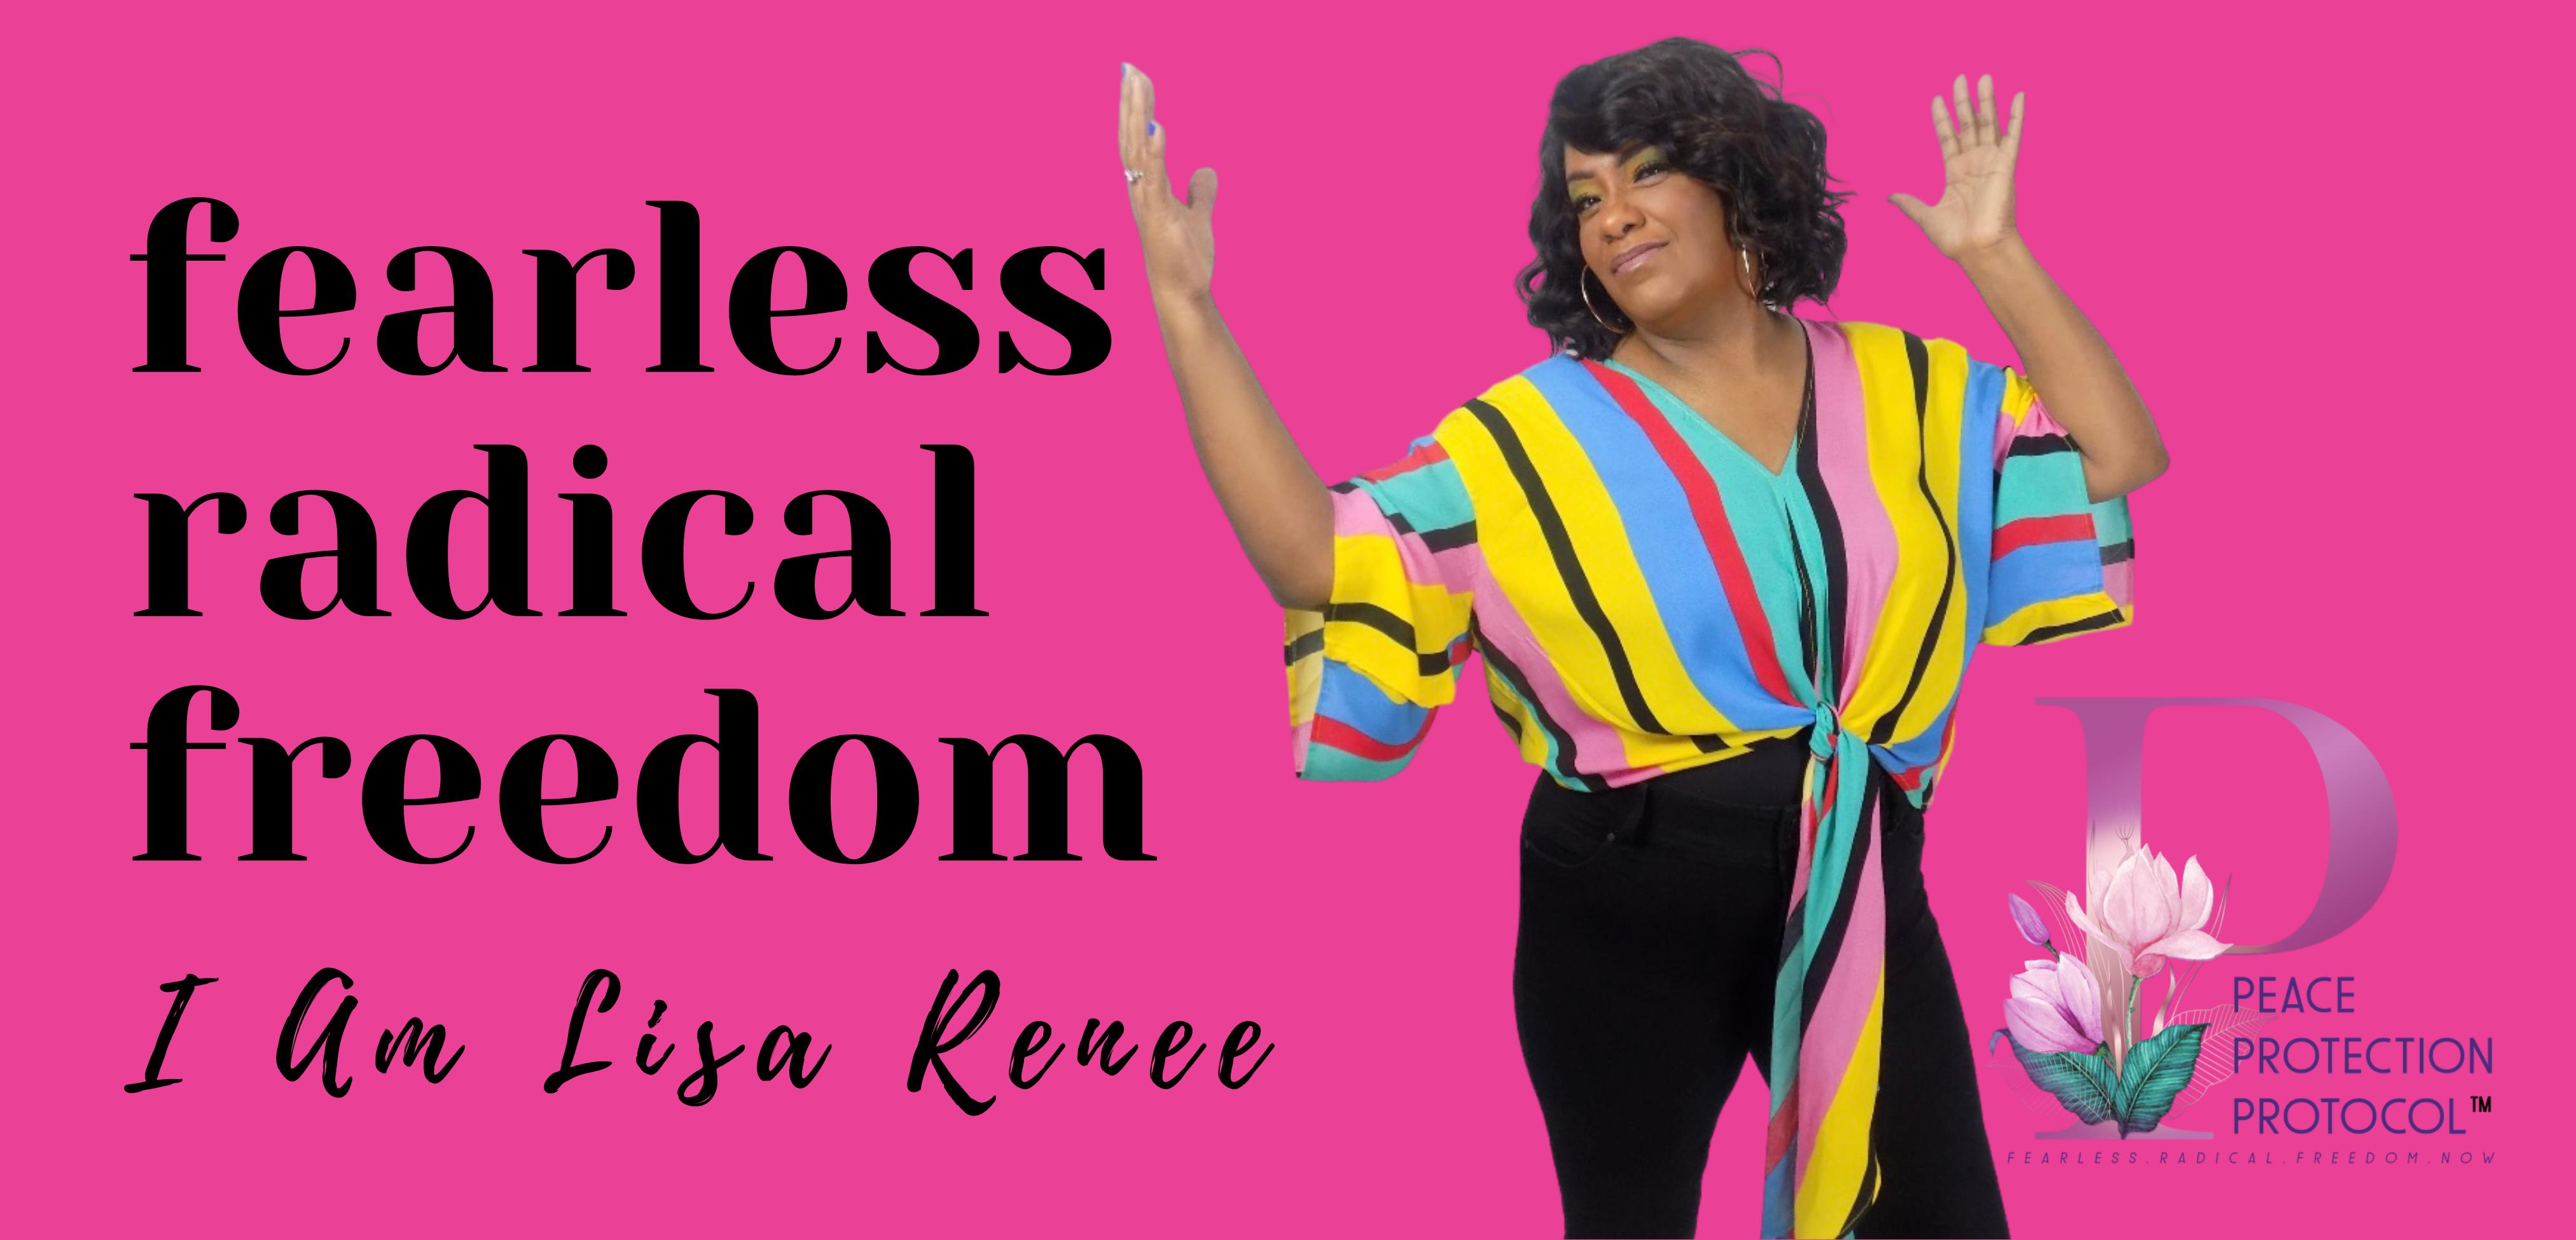 Fearless Radical Freedom I Am Lisa Renee Slogan